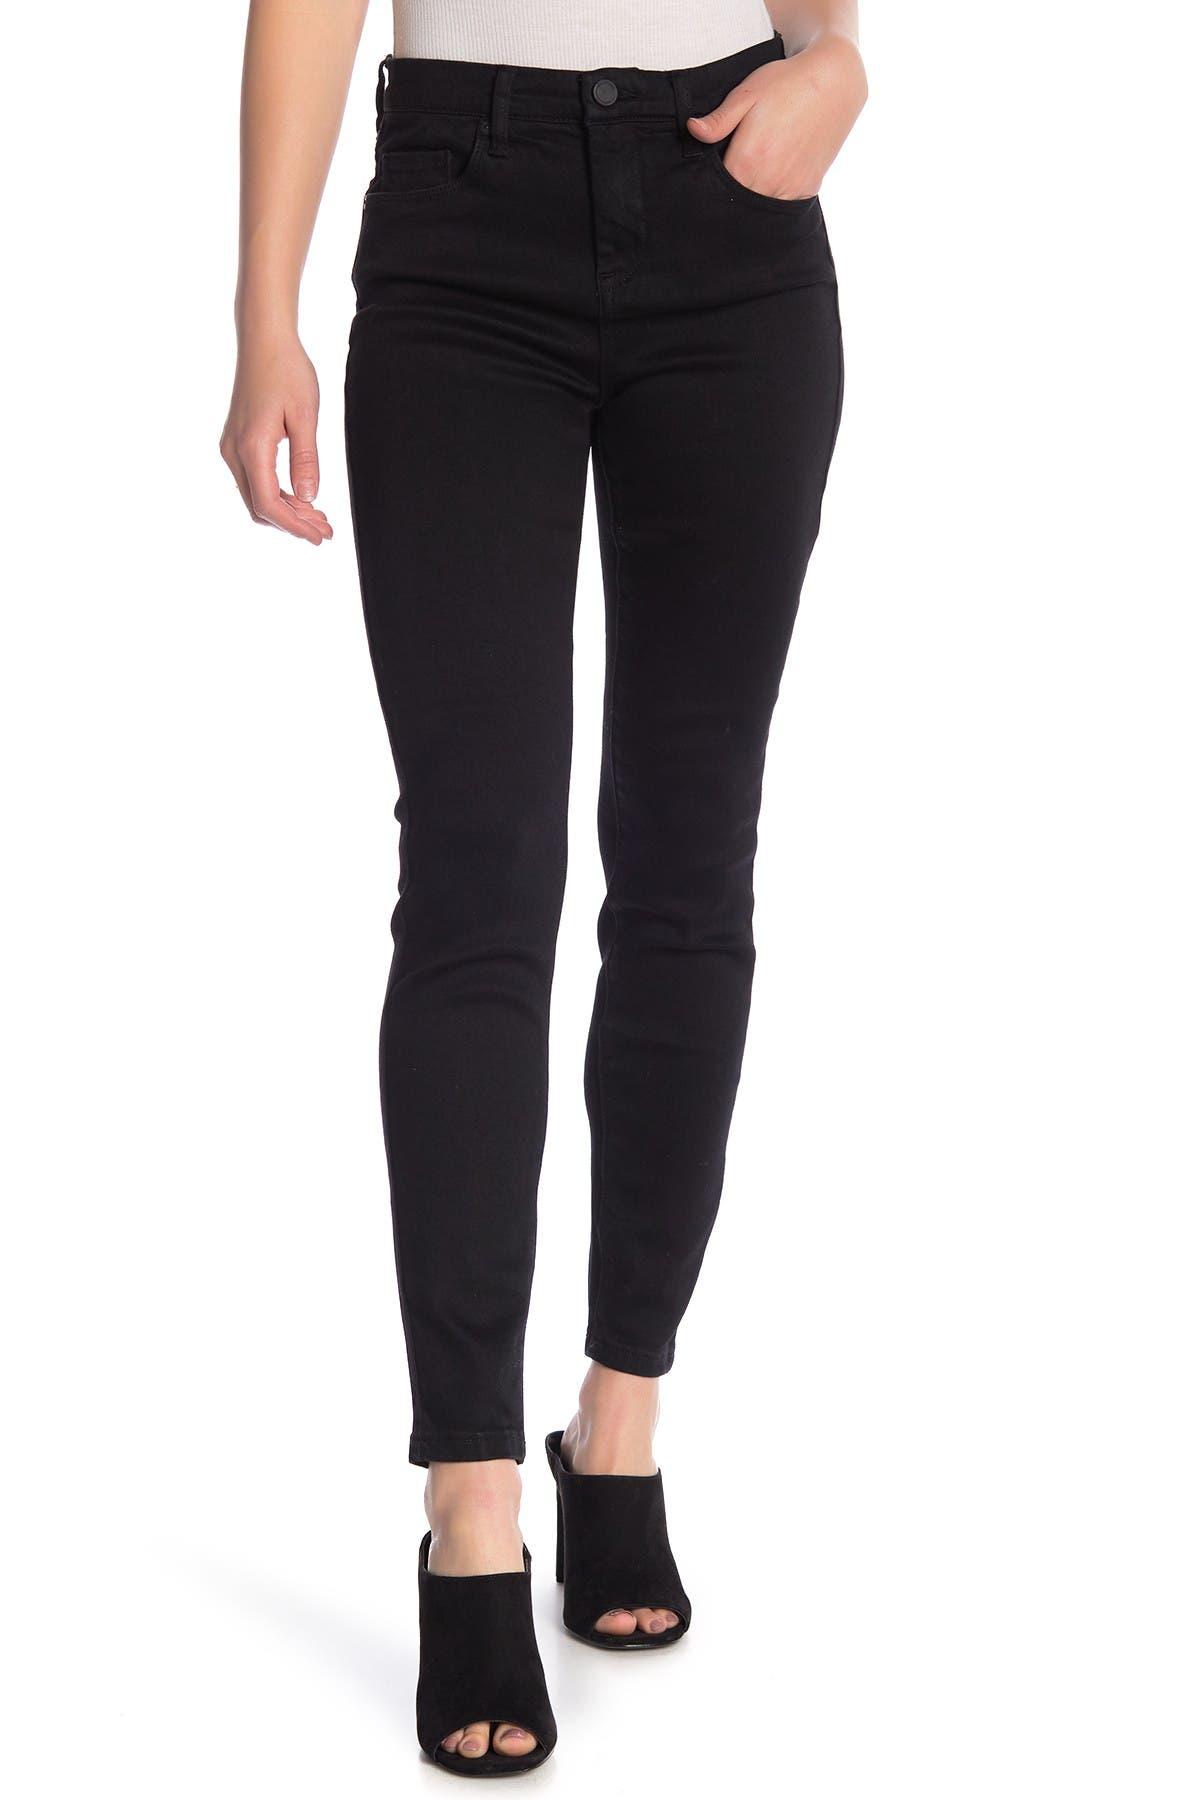 Image of BLANKNYC Denim High Rise Skinny Jeans